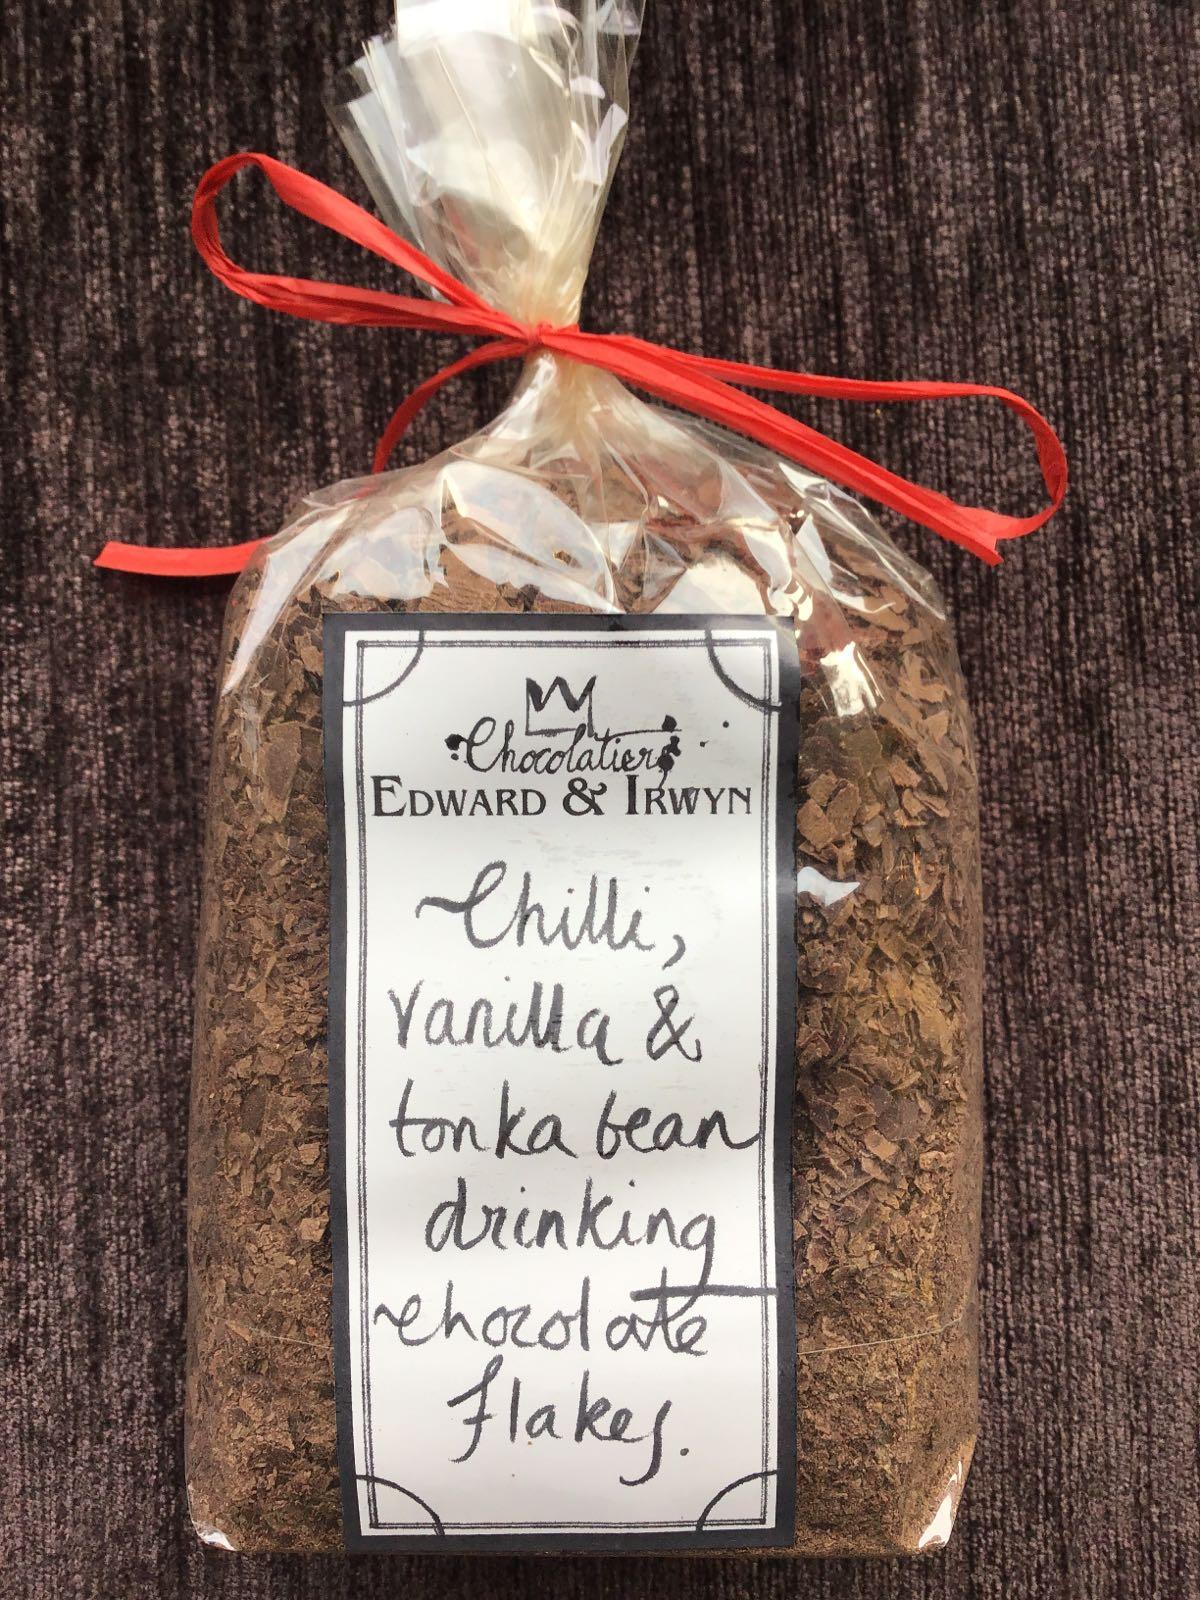 Chilli, Vanilla & Tonka Bean Hot chocolate flakes